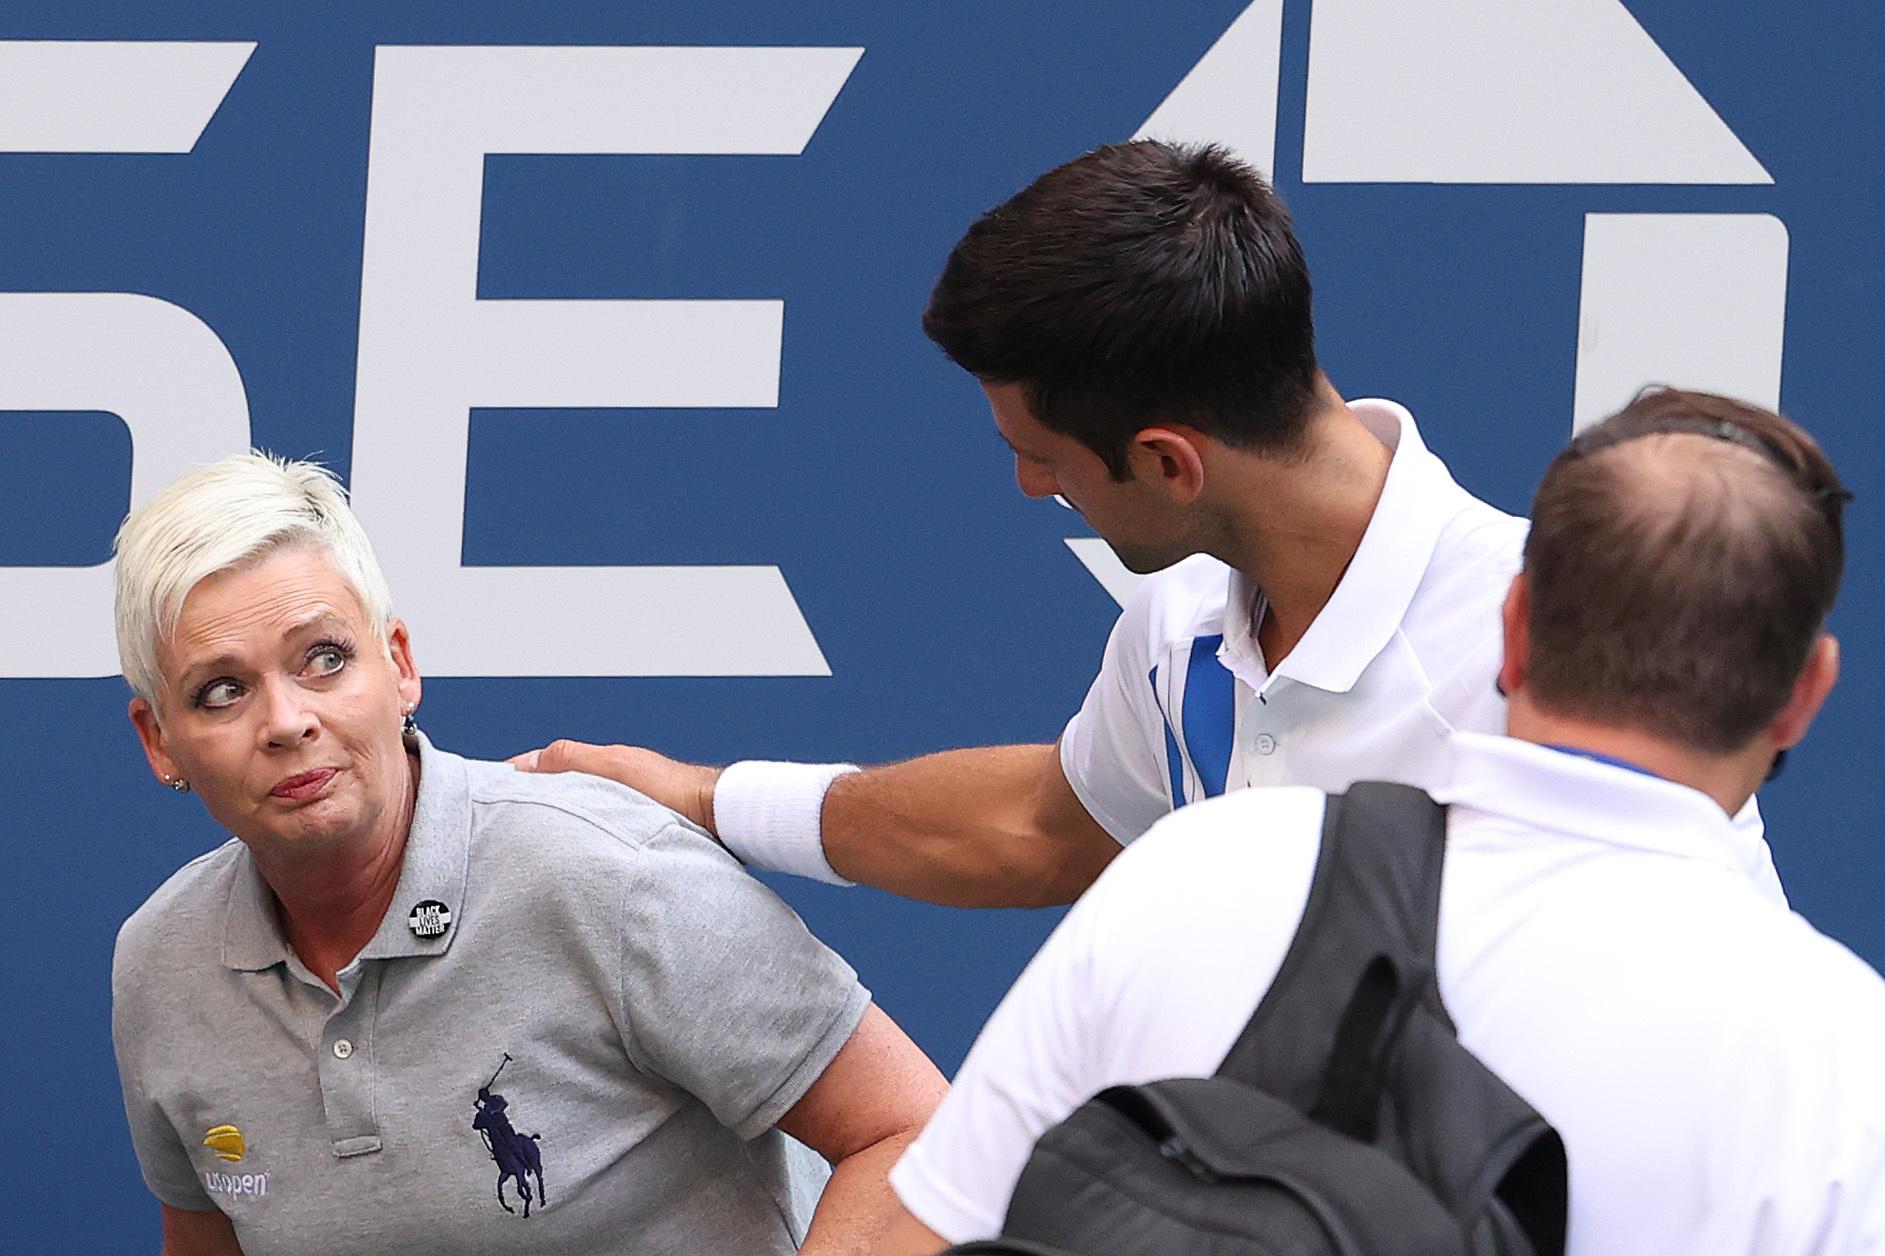 Скандал на US Open: Джоковича с позором выгнали с турнира